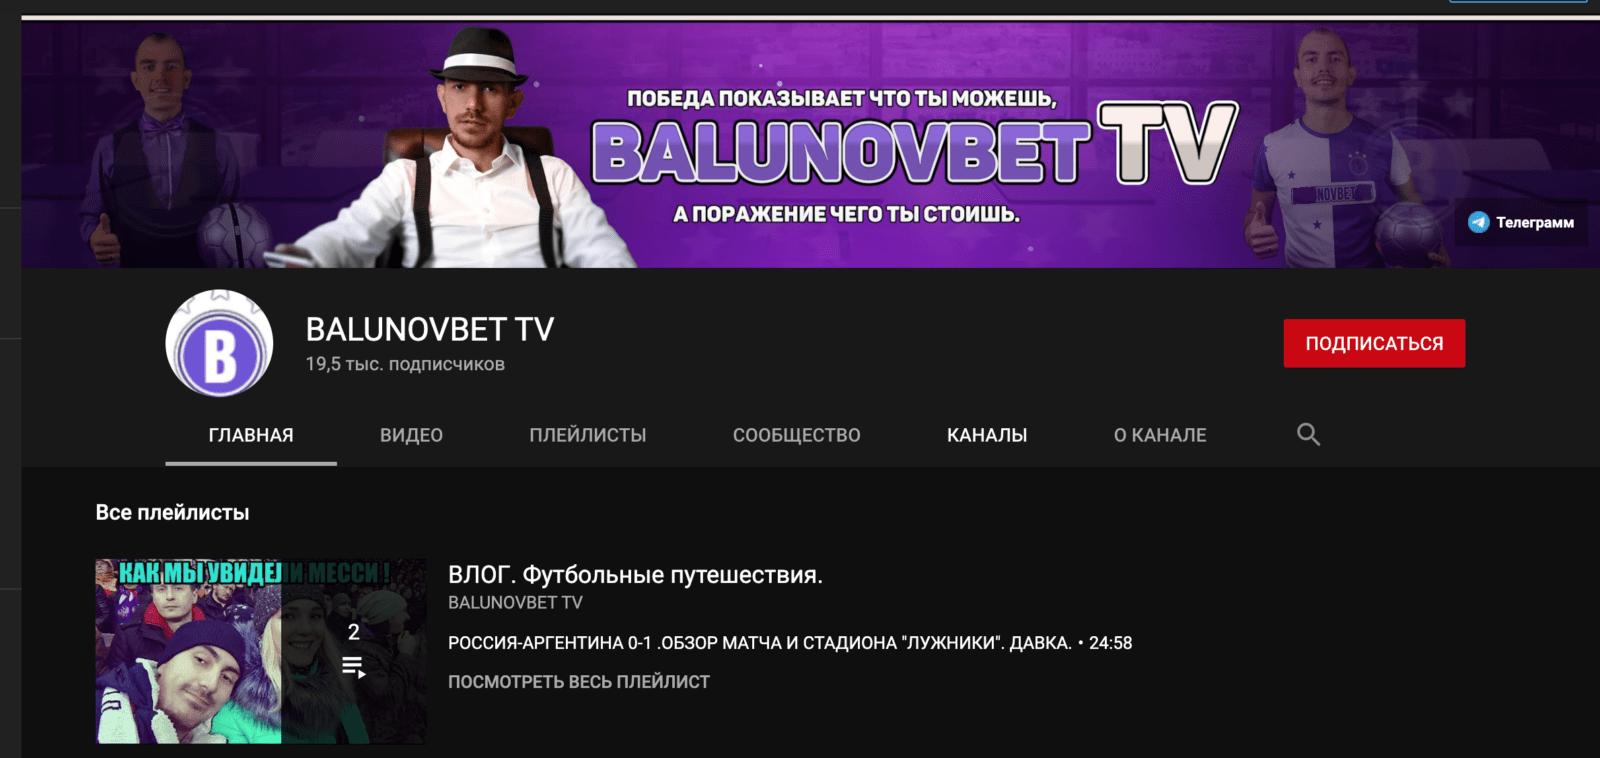 Ютуб канал Balunovbet tv